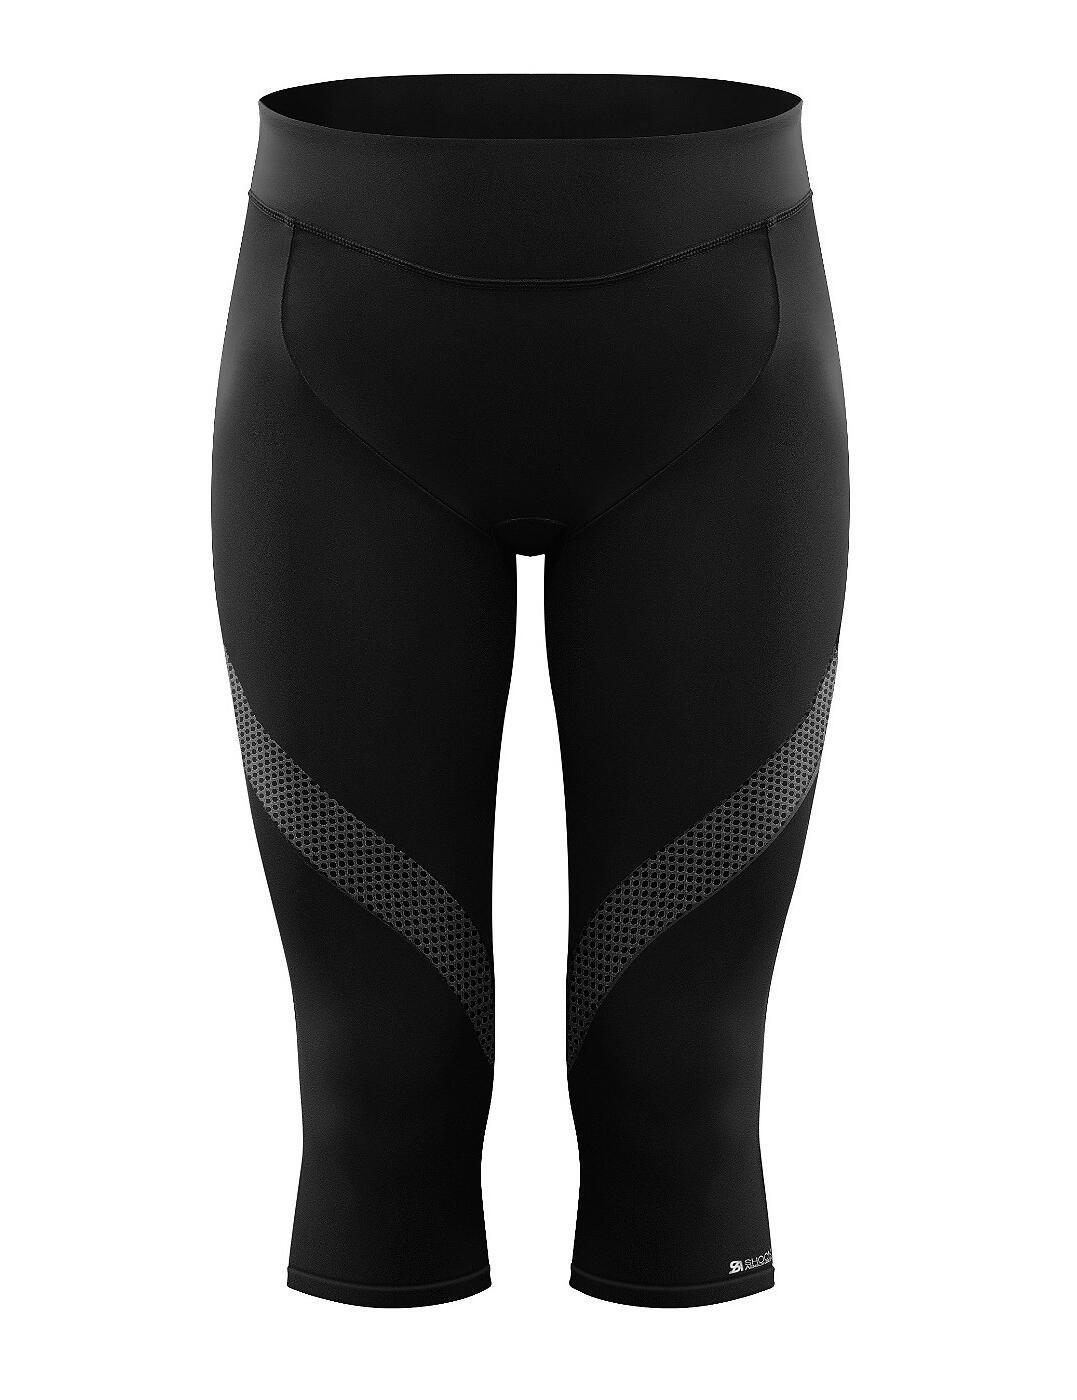 Shock Absorber Sports Activewear Capri Longueur Leggings S066C Noir